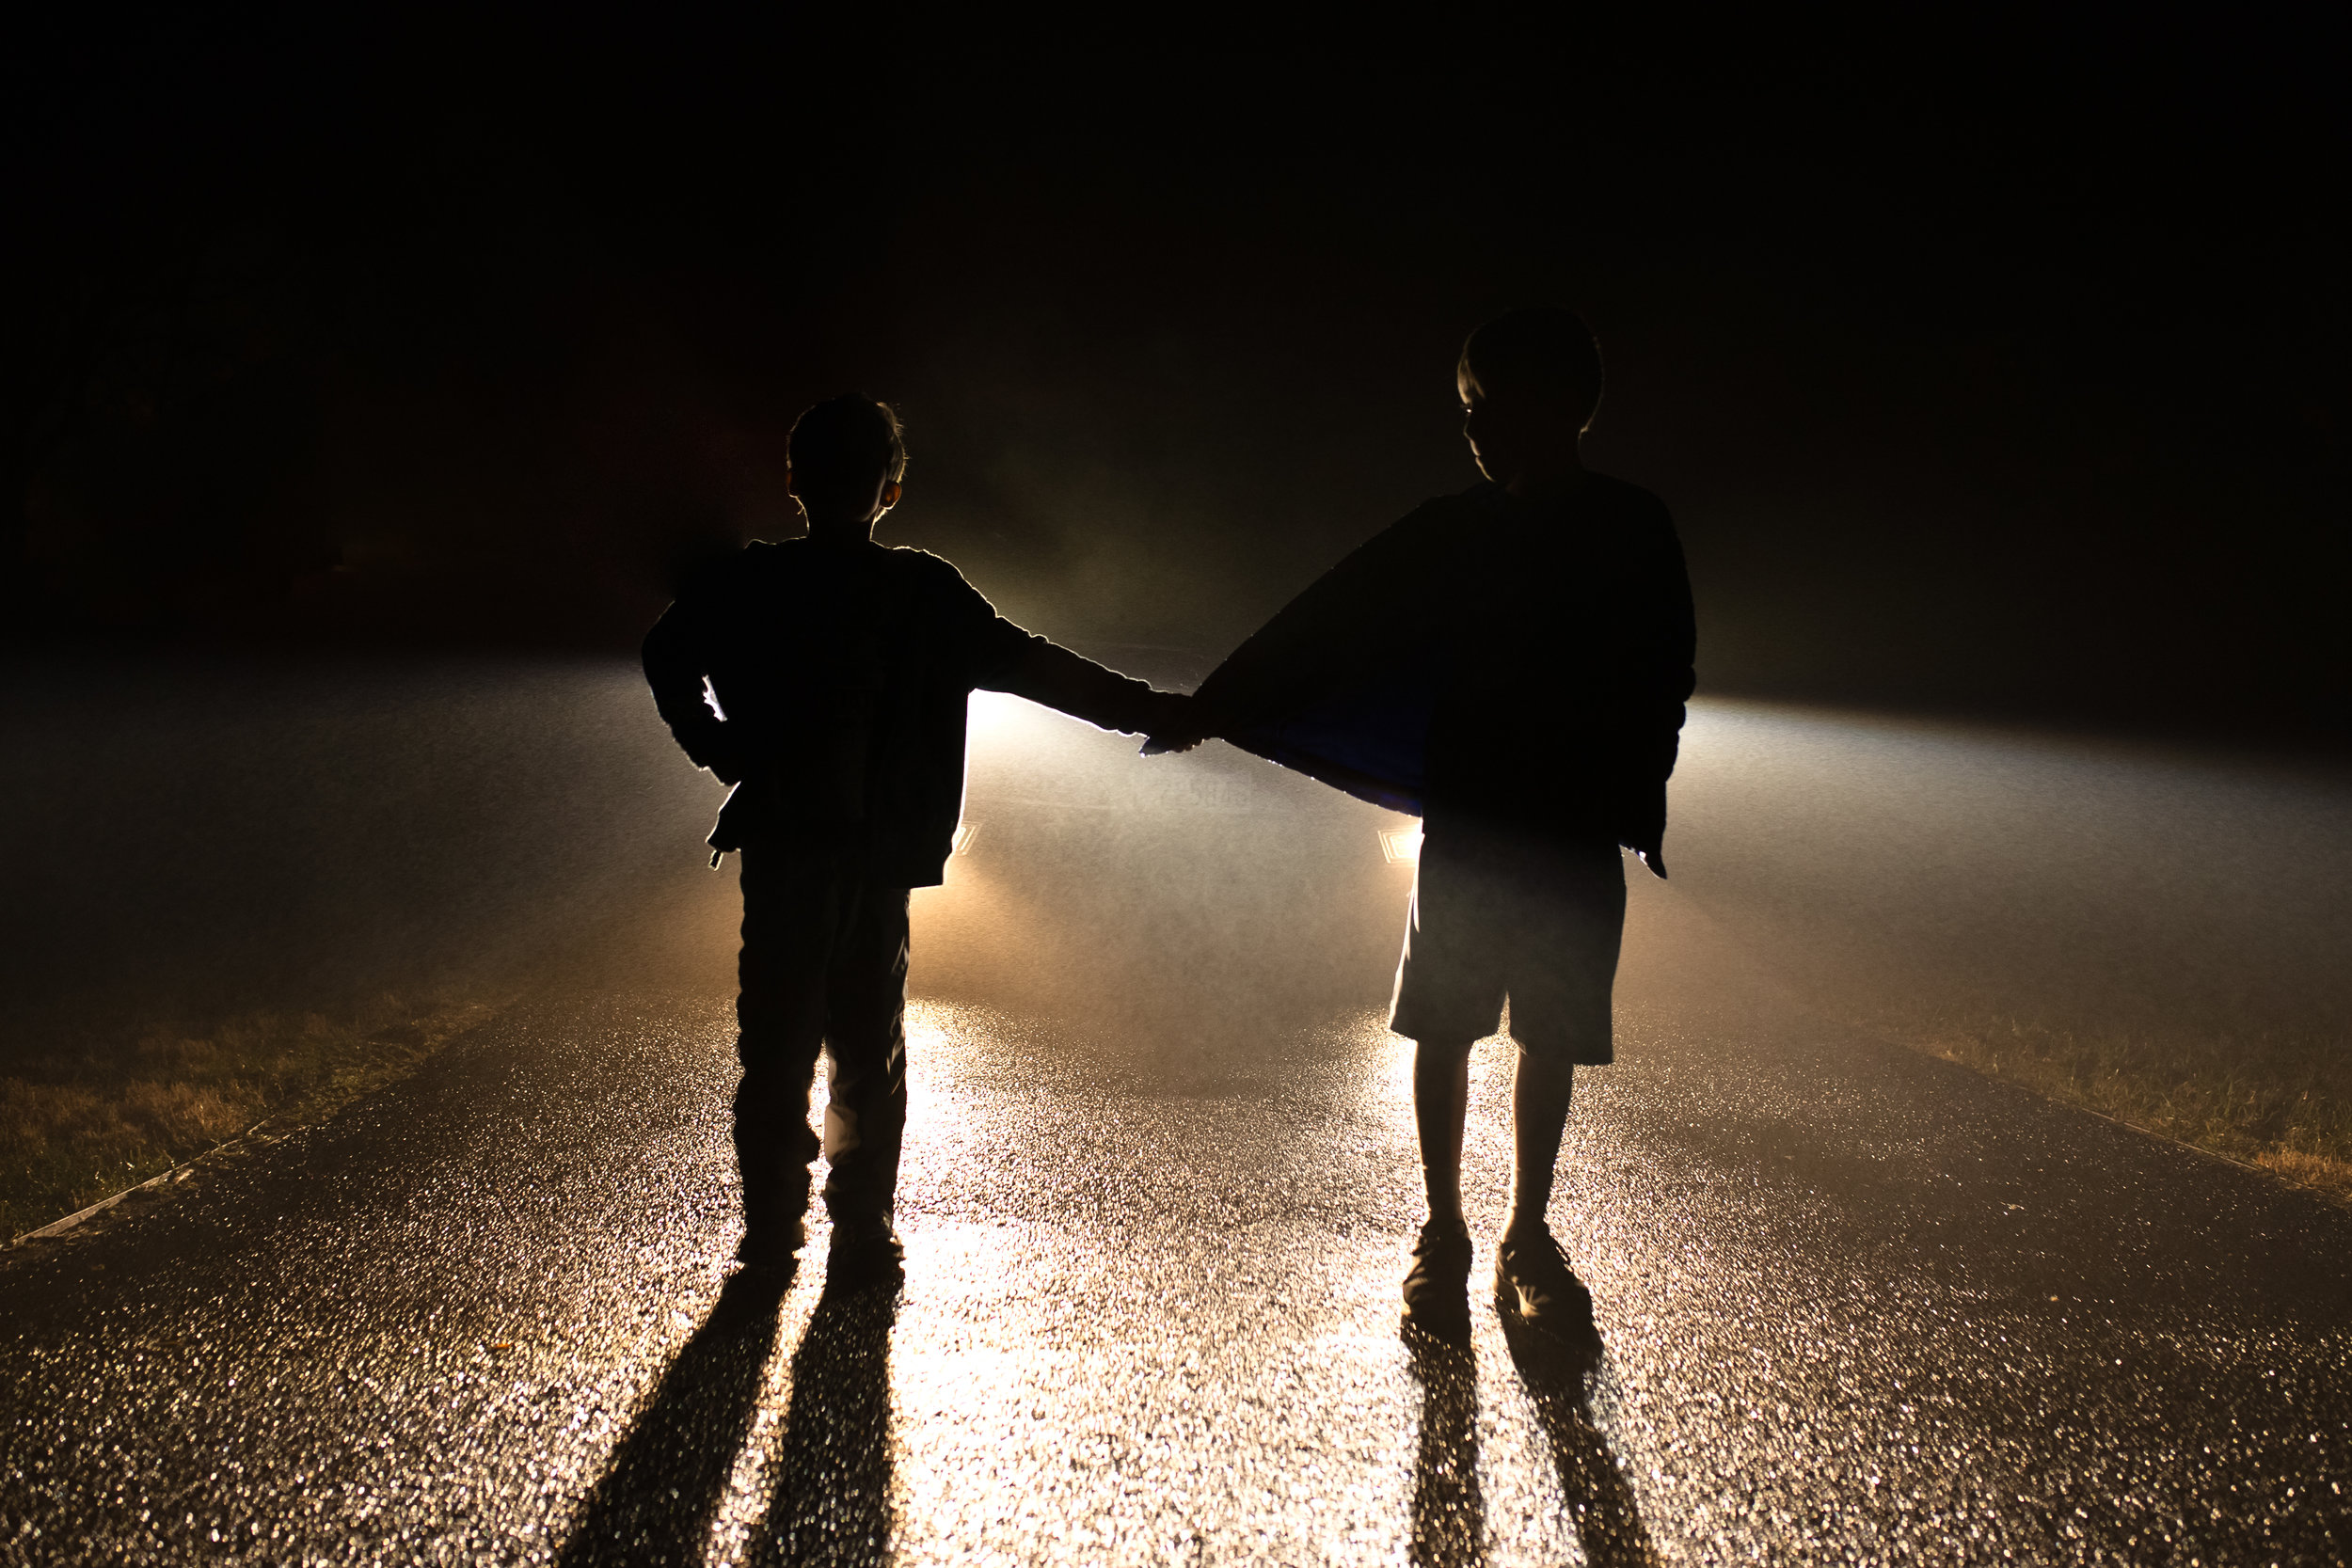 Eli and Will headlights-0130.jpg